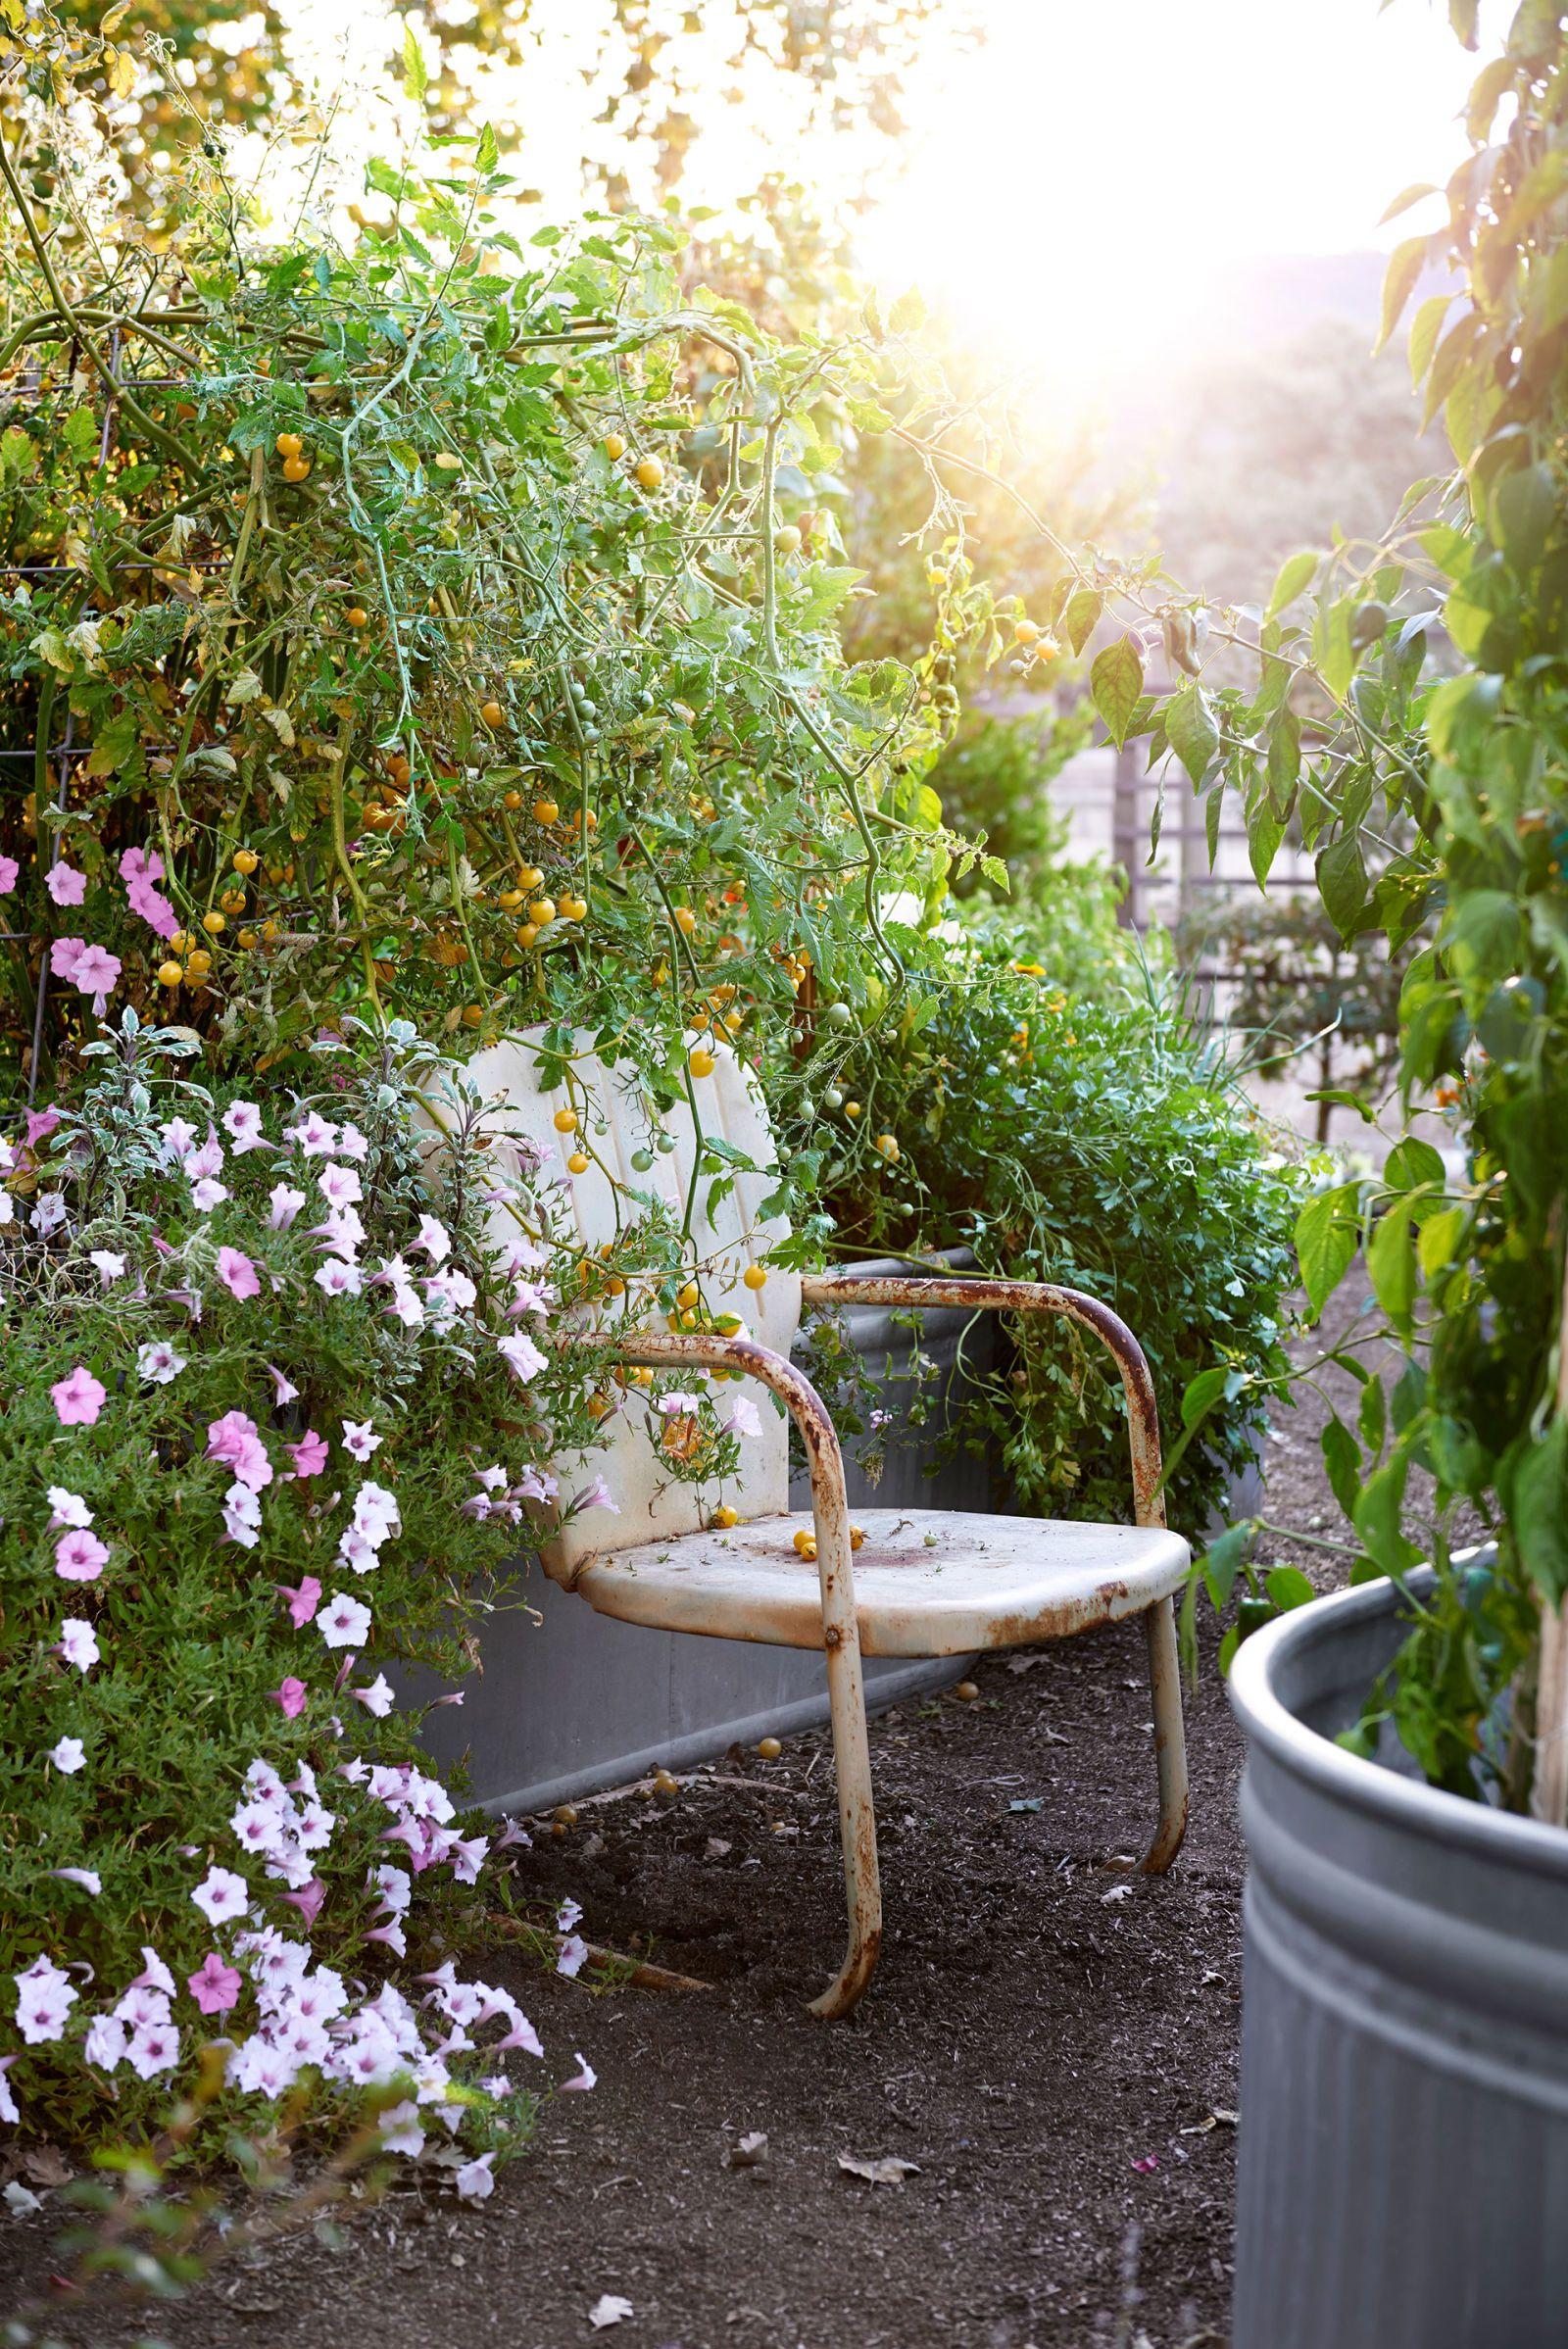 28 New Ideas for Your Garden